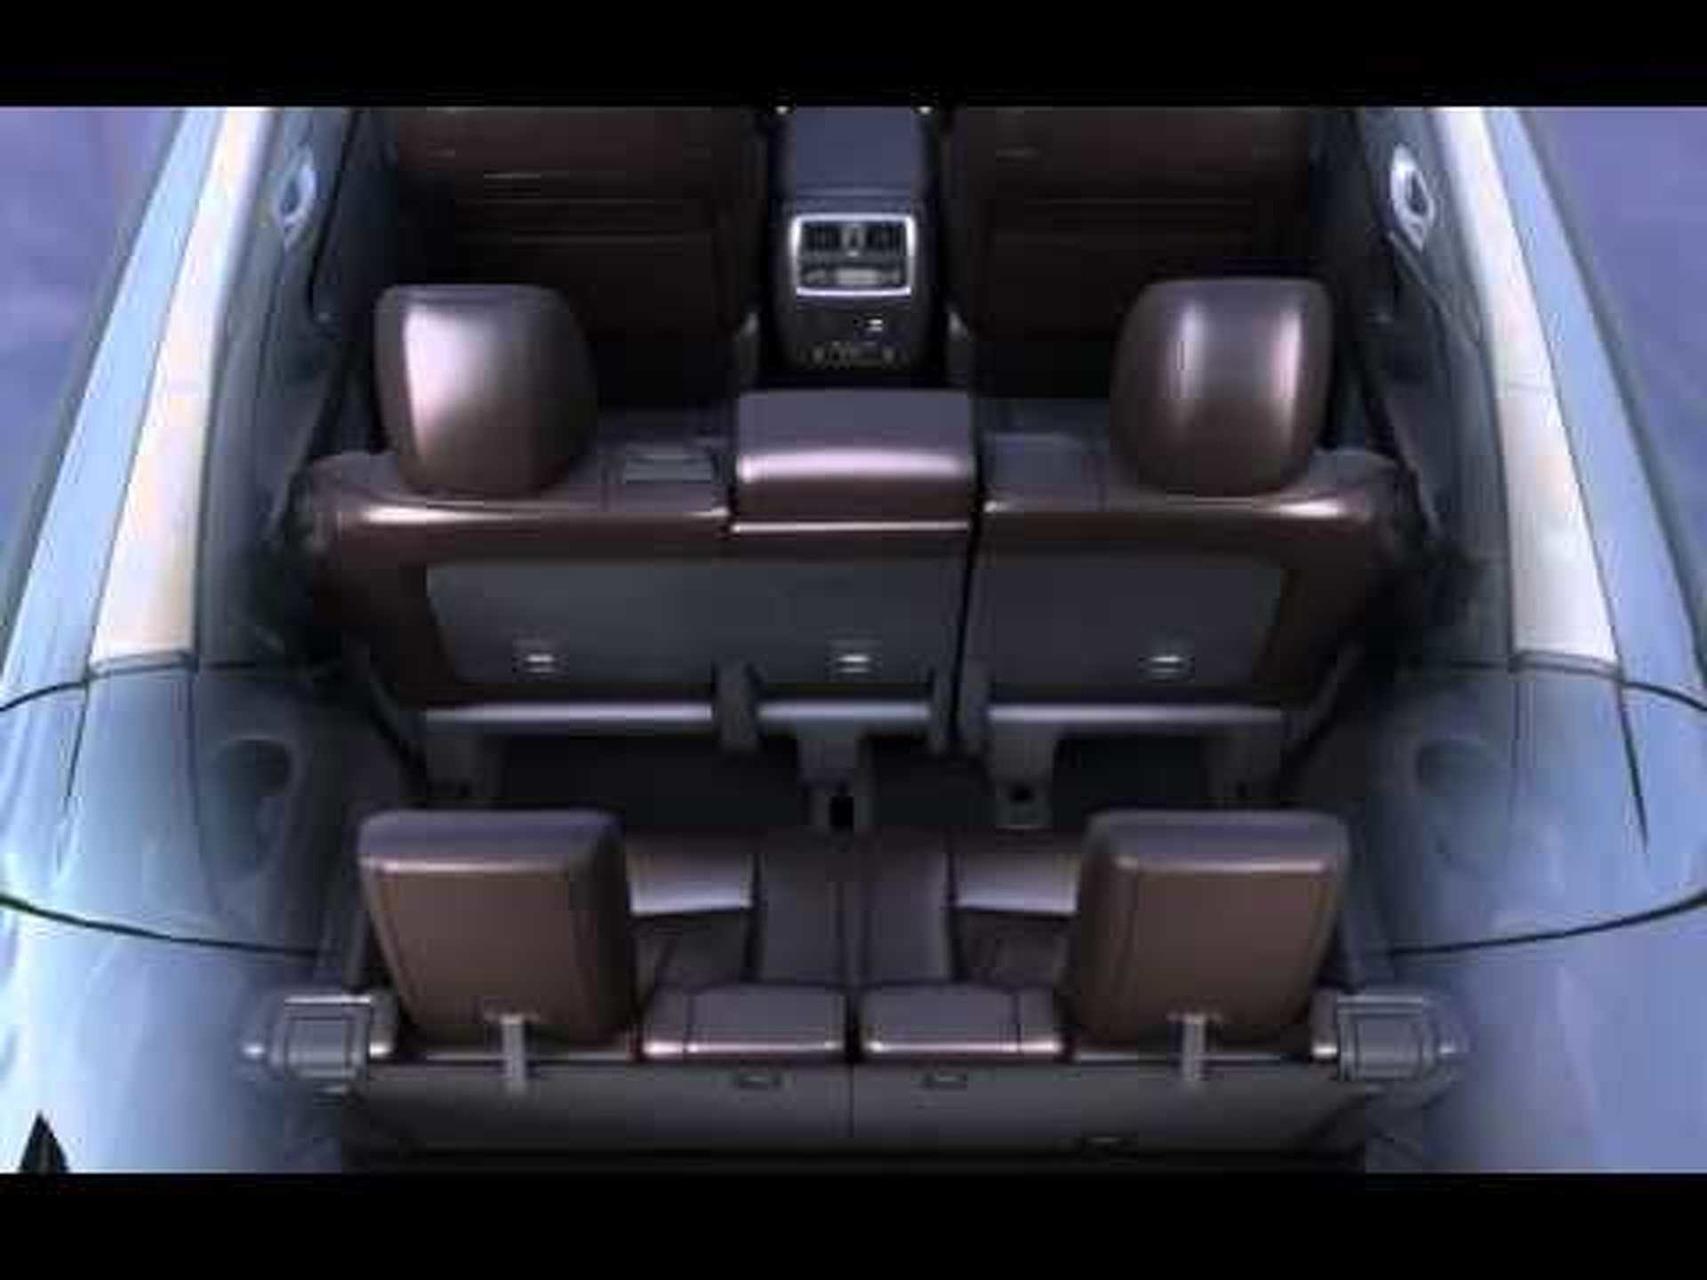 2013 Infiniti JX - 2nd Row Sliding Seats